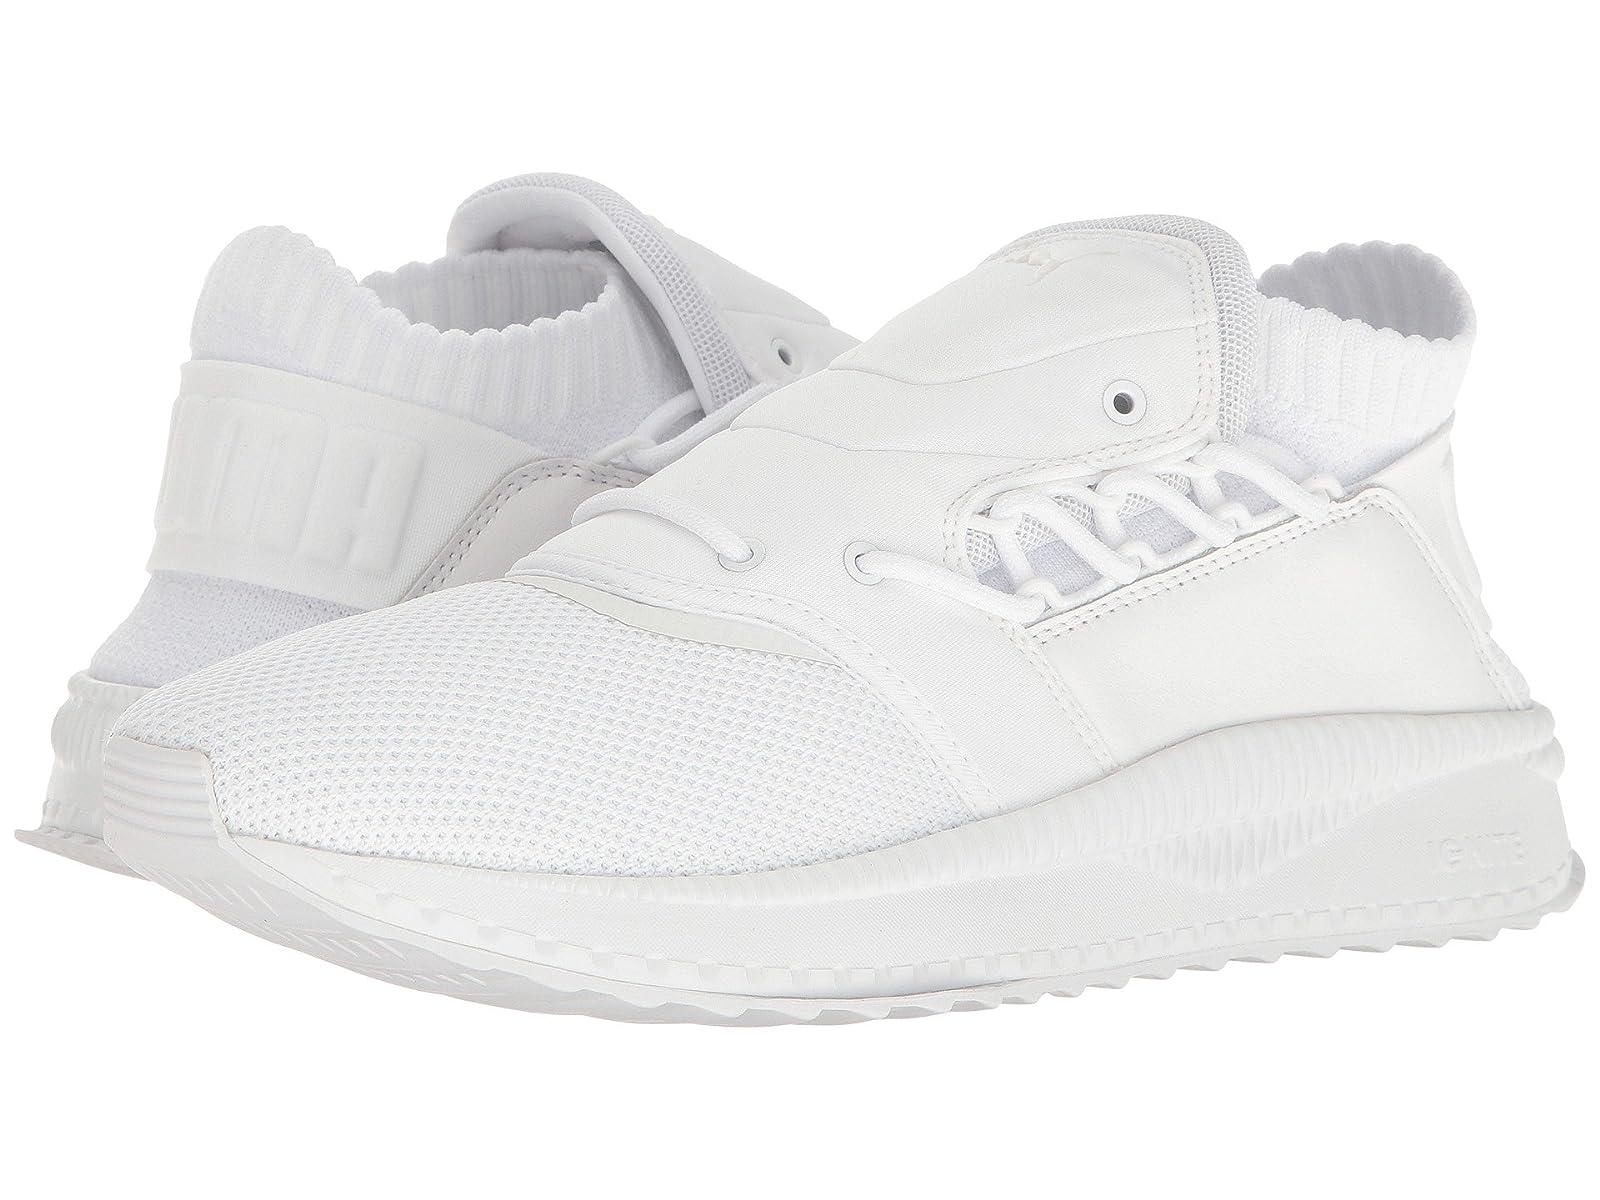 PUMA Tsugi ShinseiCheap and distinctive eye-catching shoes